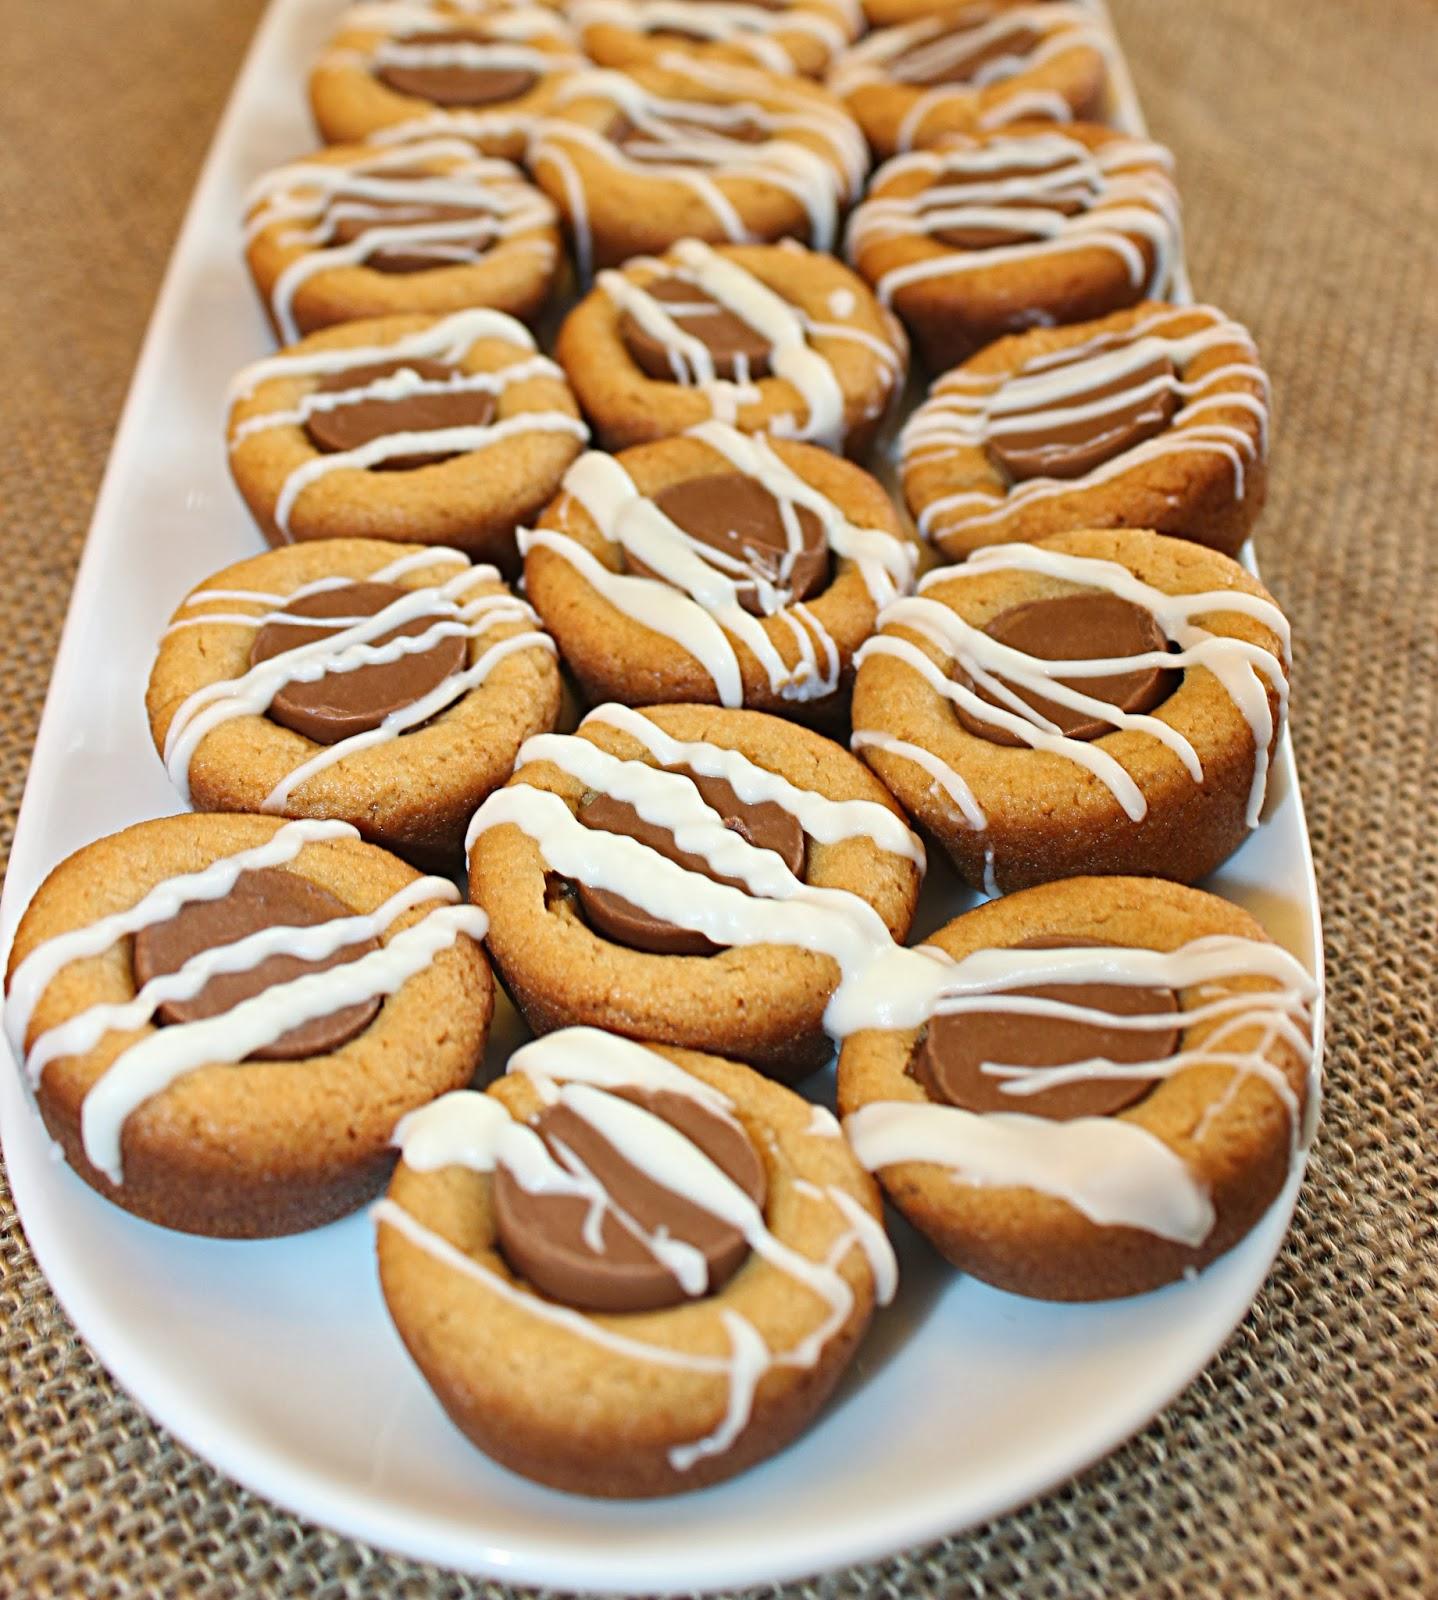 sugar & spice: Mini Peanut Butter Rolo Cookies